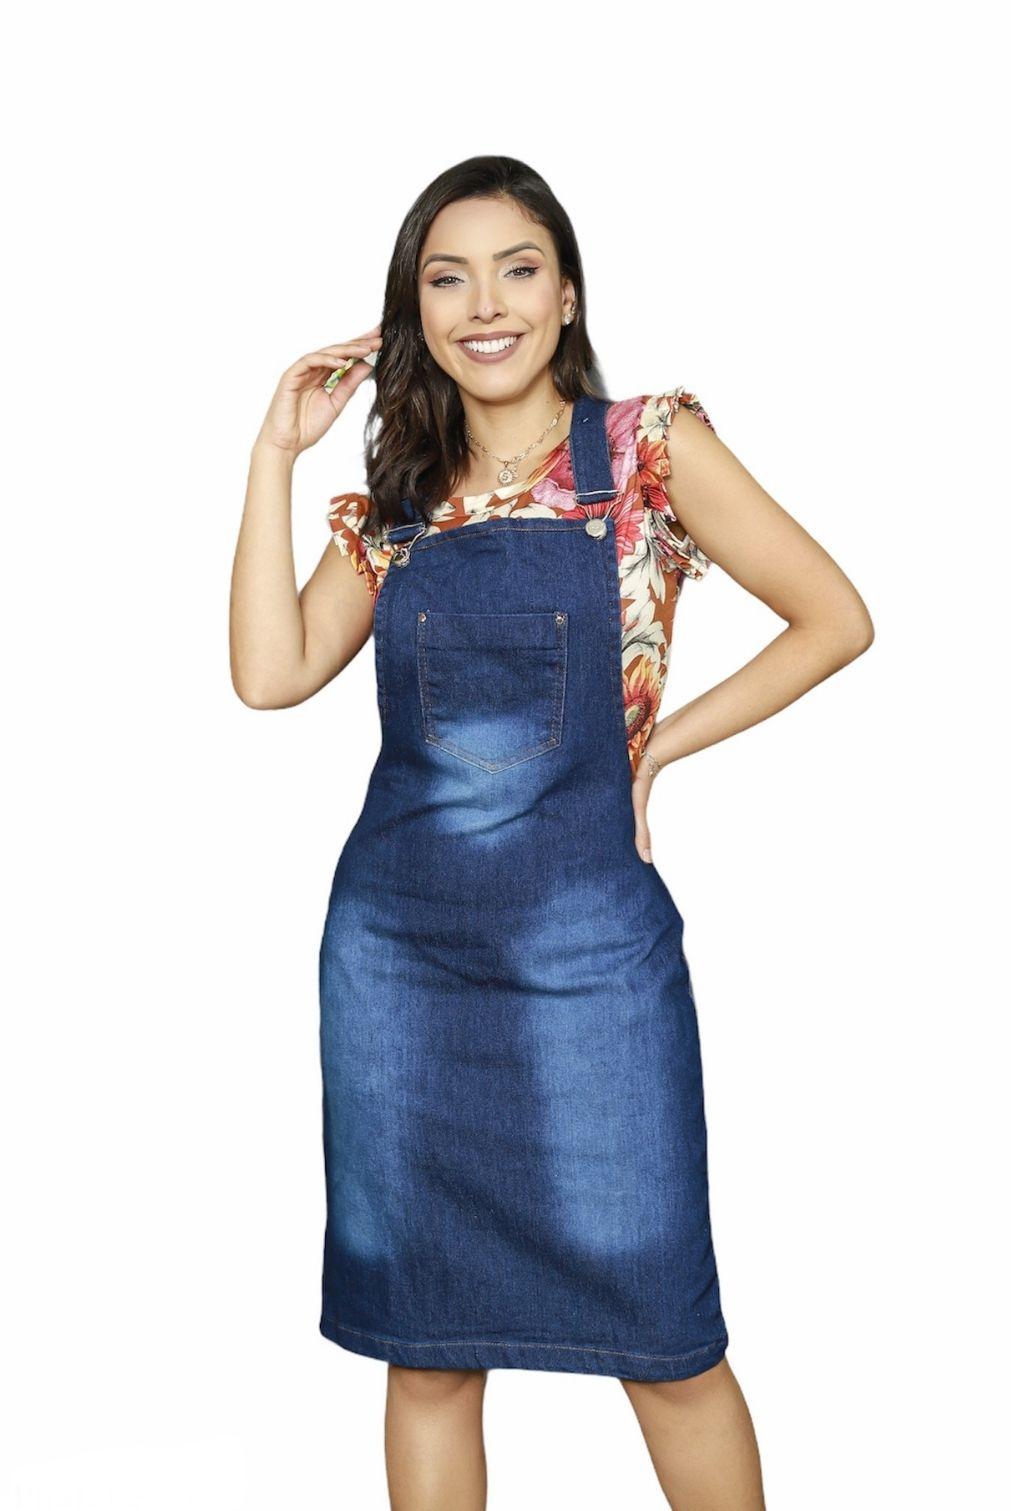 Jardineira Salopete Feminina Jeans Moda Evangélica Midi Bolso Frontal  - ModaStore   Moda Feminina